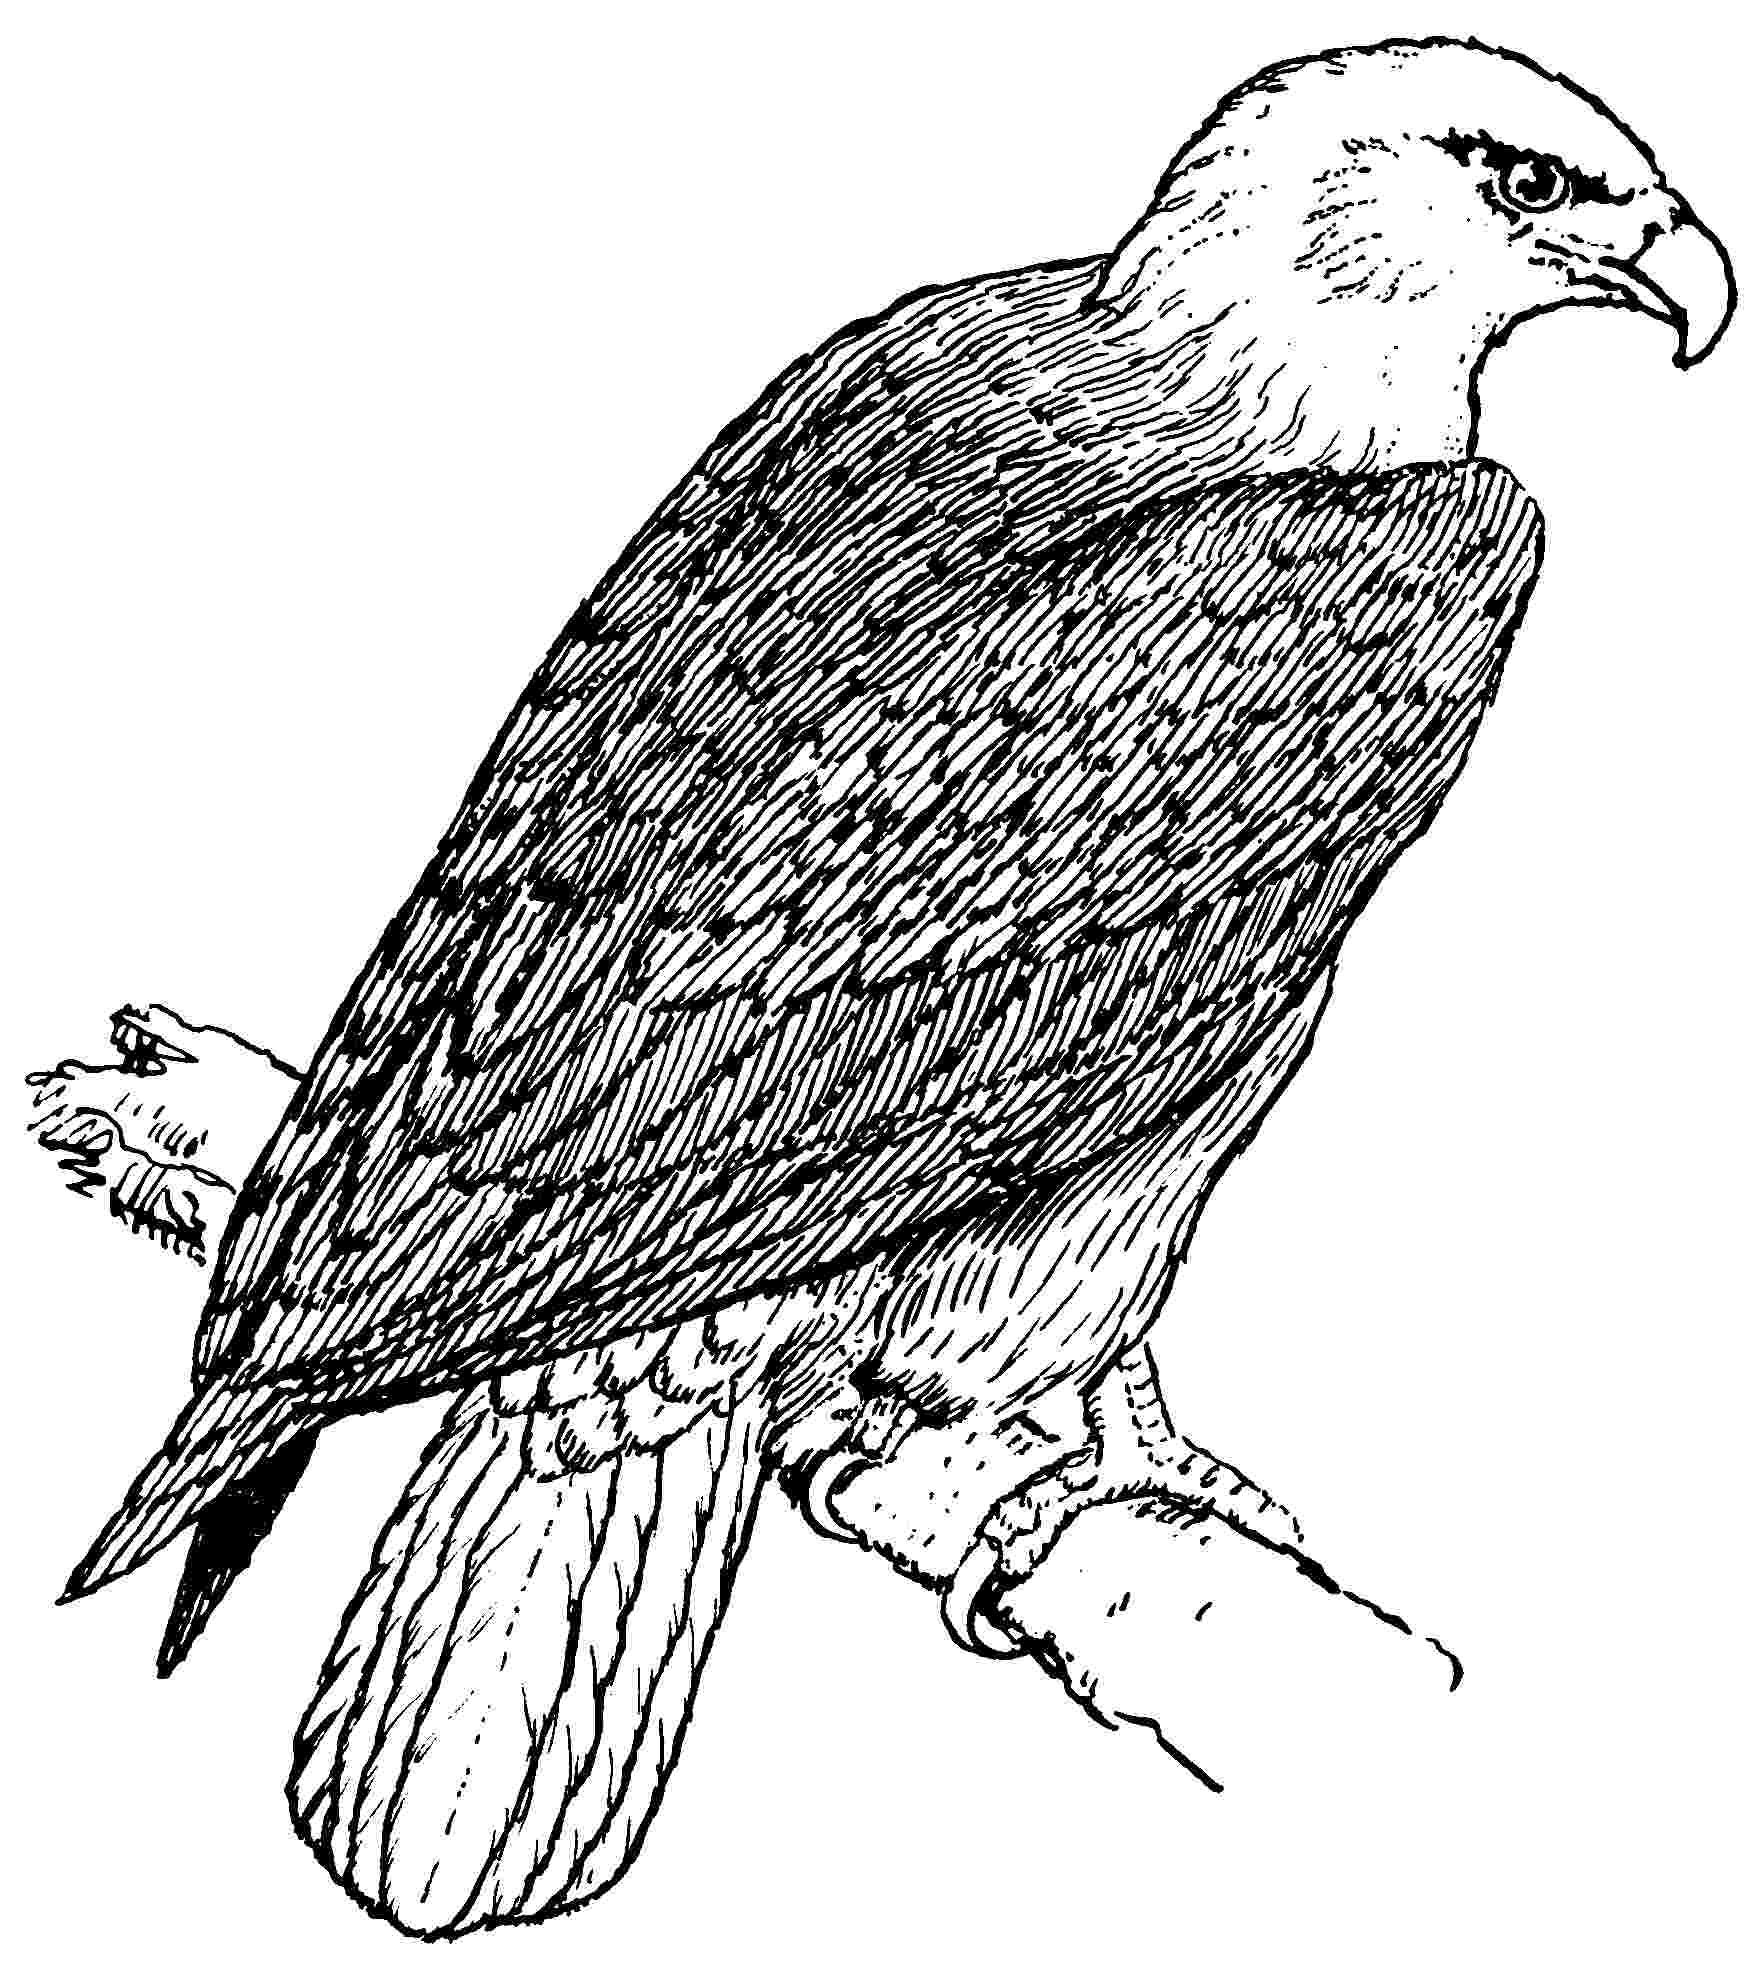 coloring book eagle free printable eagle coloring pages for kids eagle coloring book